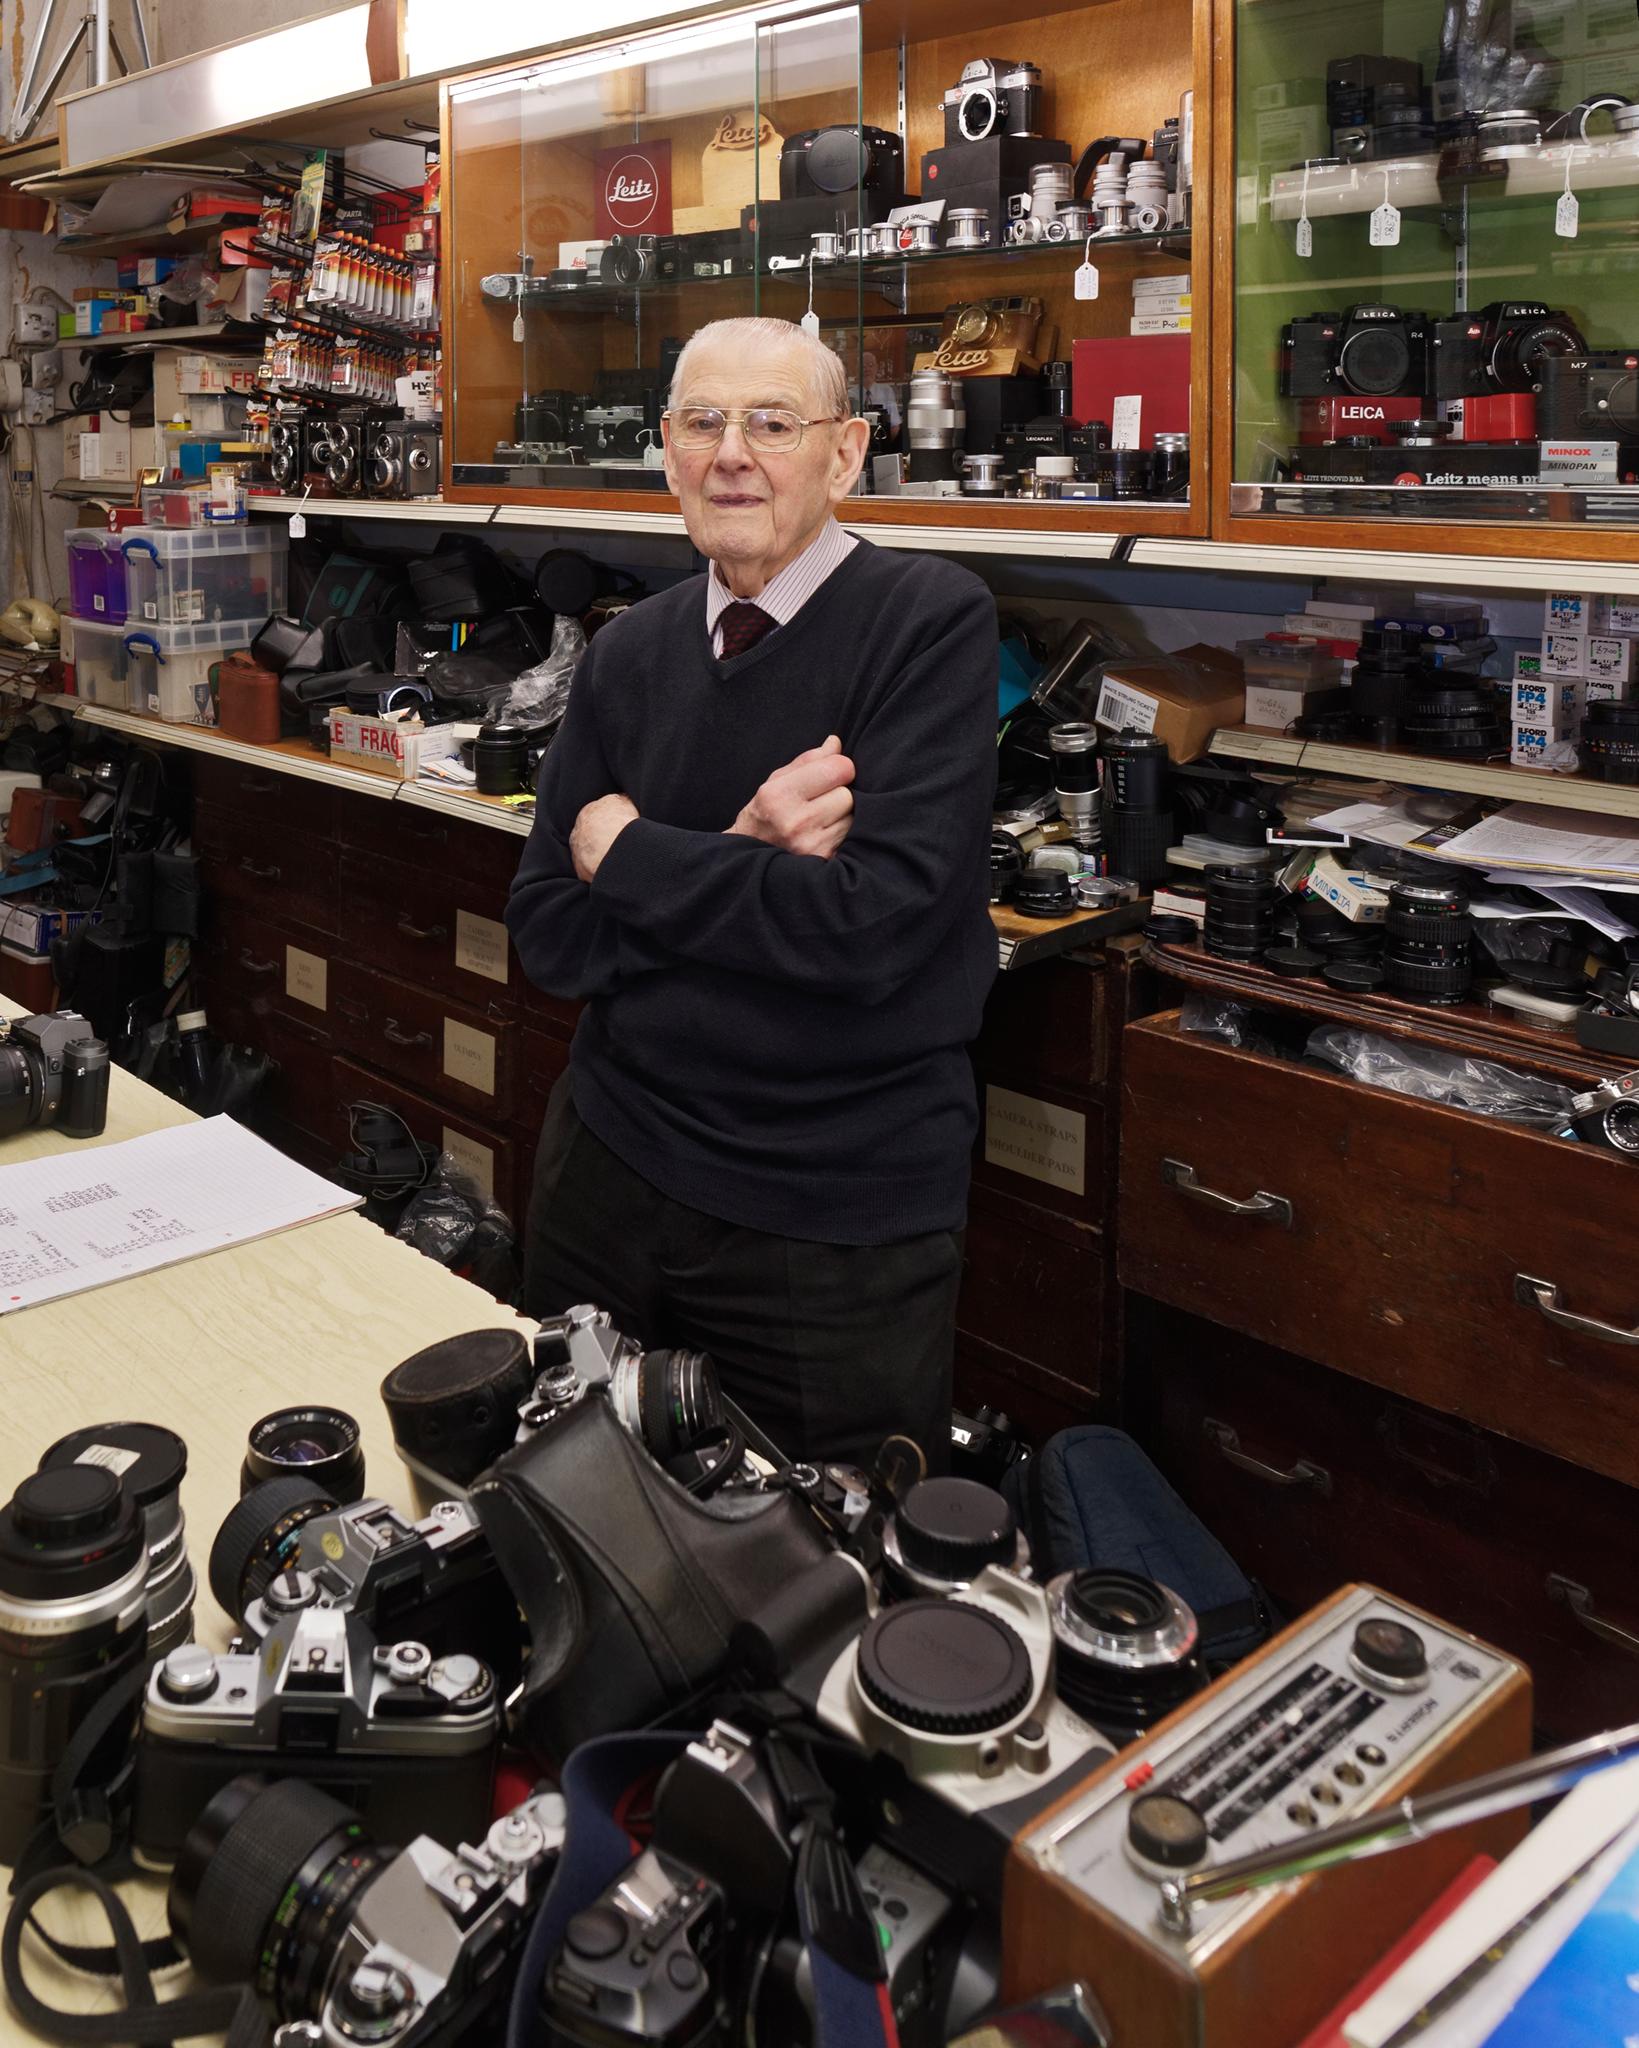 Reg, Croydon's oldest worker?